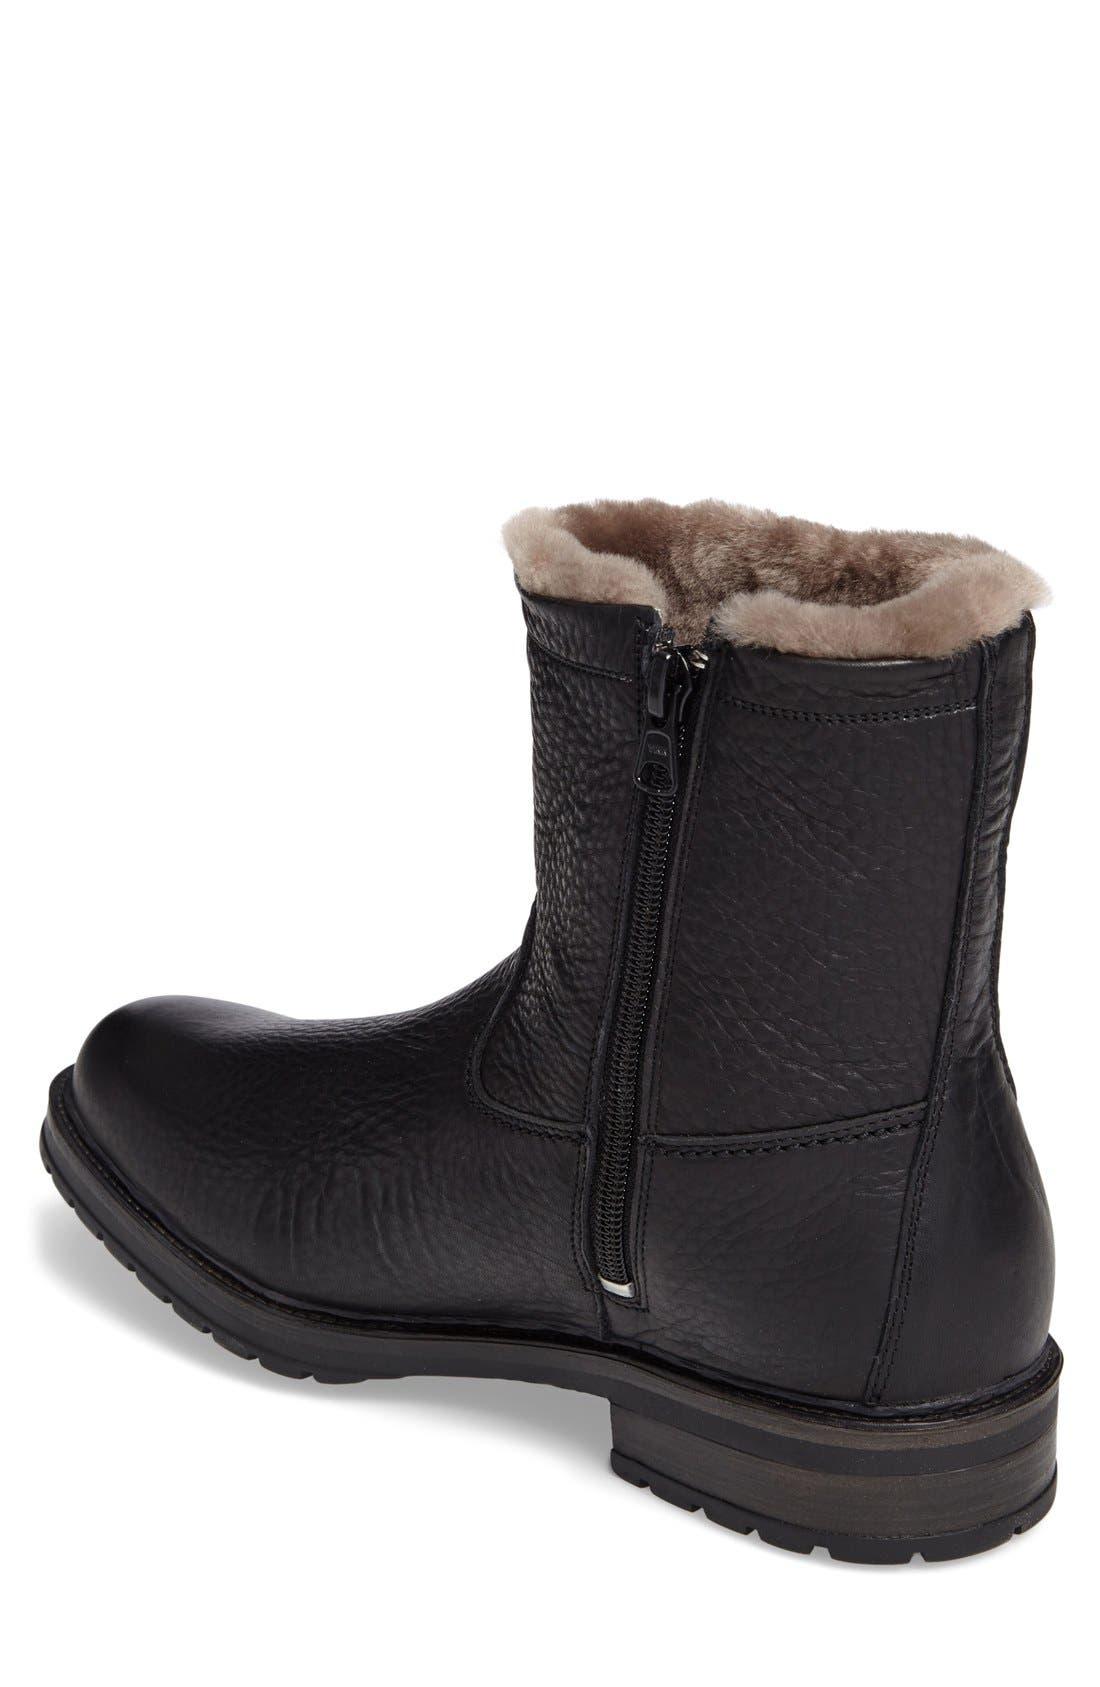 Leonardo Genuine Shearling Lined Boot,                             Alternate thumbnail 2, color,                             Black Montana